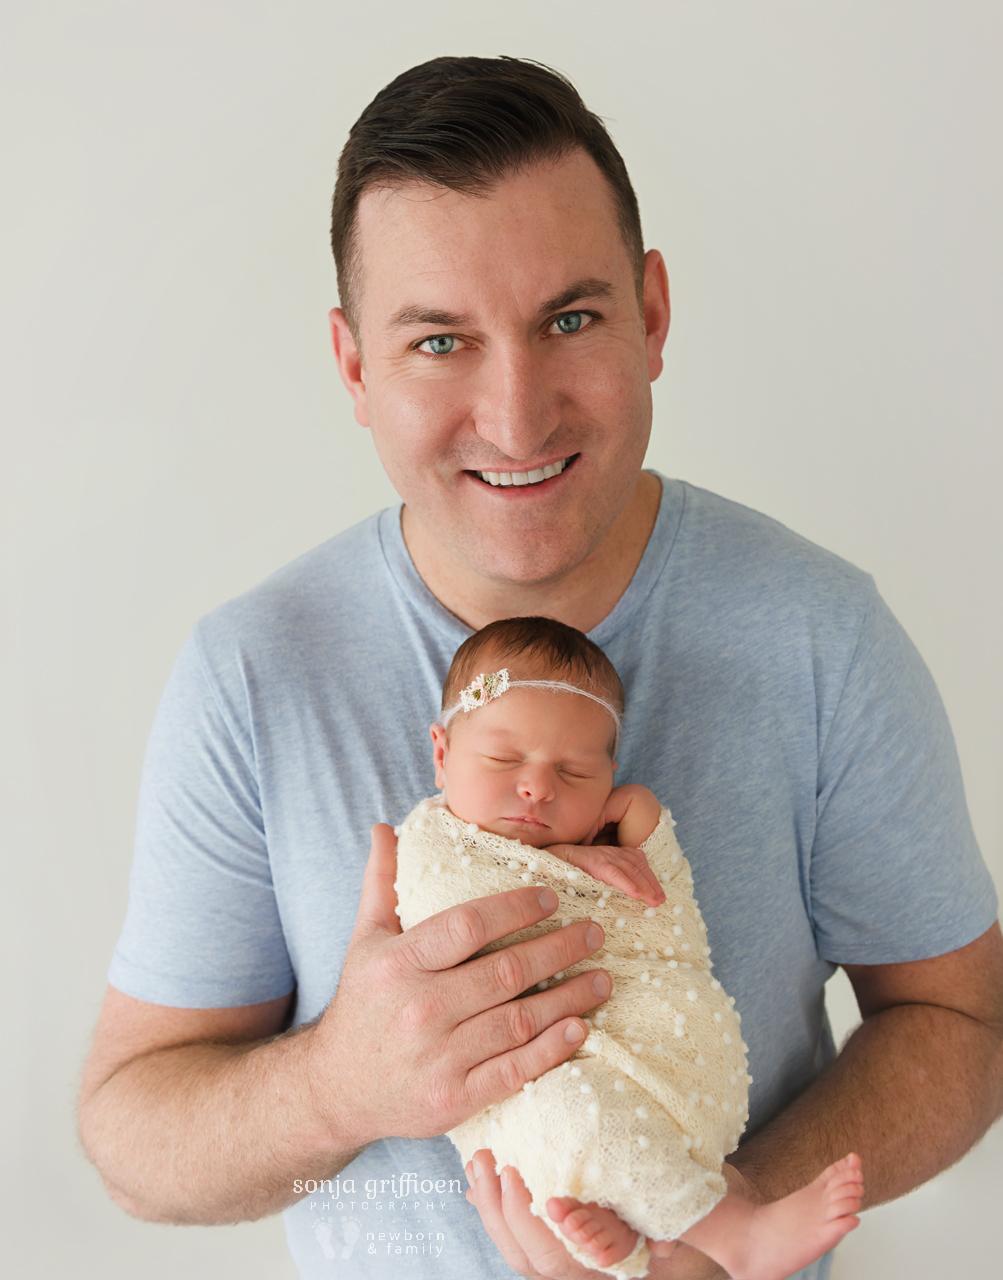 Lara-Newborn-Brisbane-Newborn-Photographer-Sonja-Griffioen-051.jpg